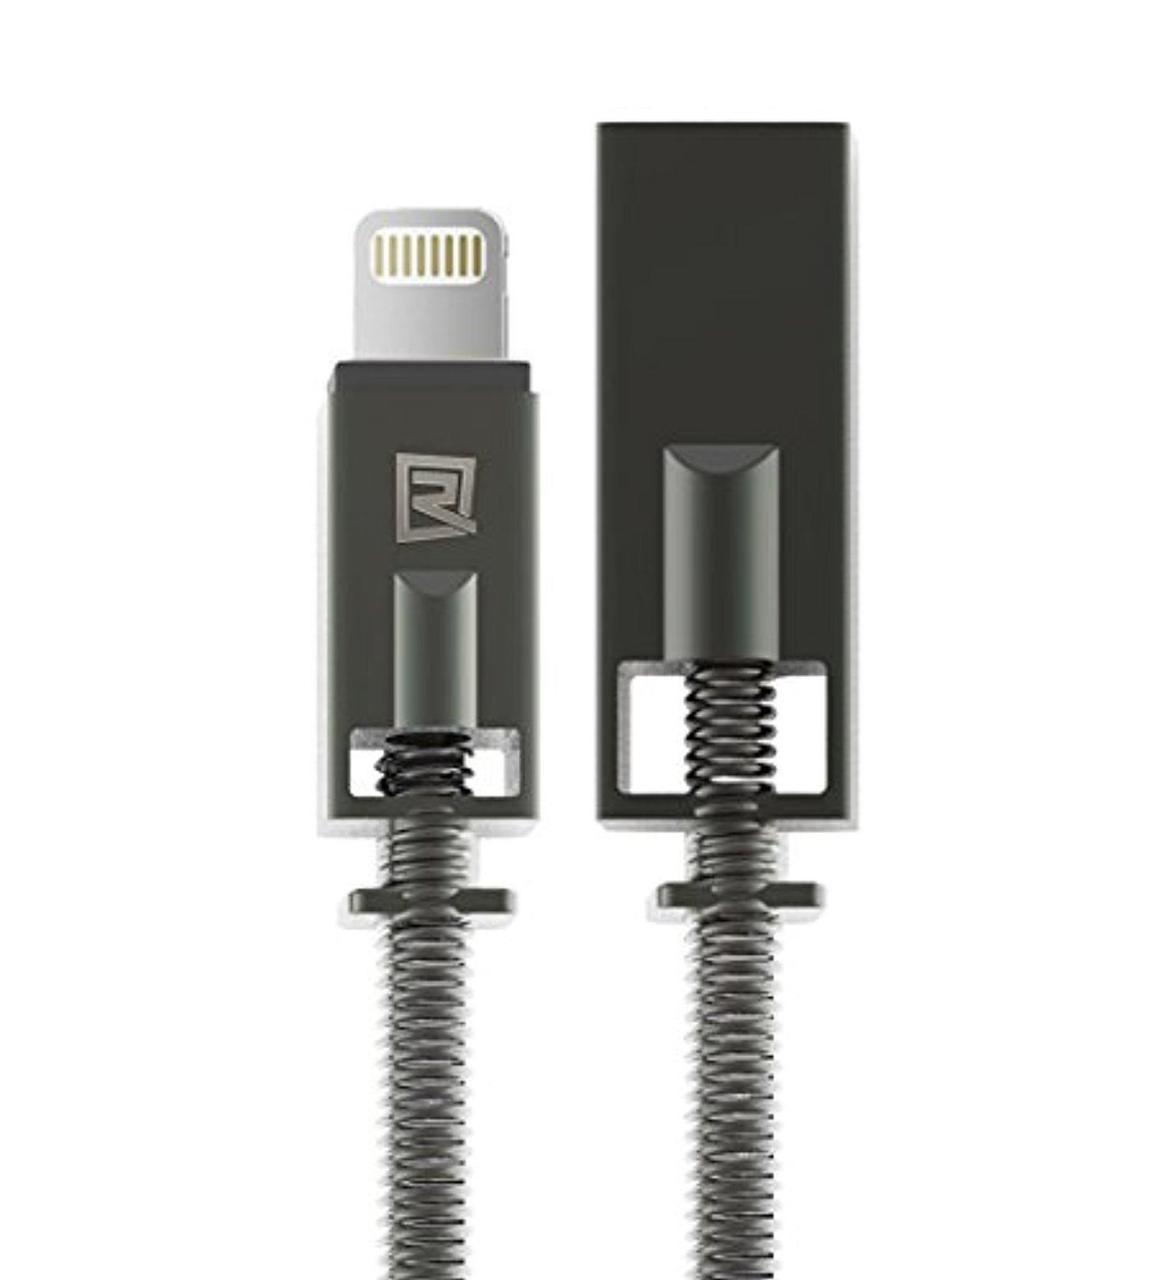 ✅ USB кабель Remax Lightning Royalty RC-056i 2.1A 1m black